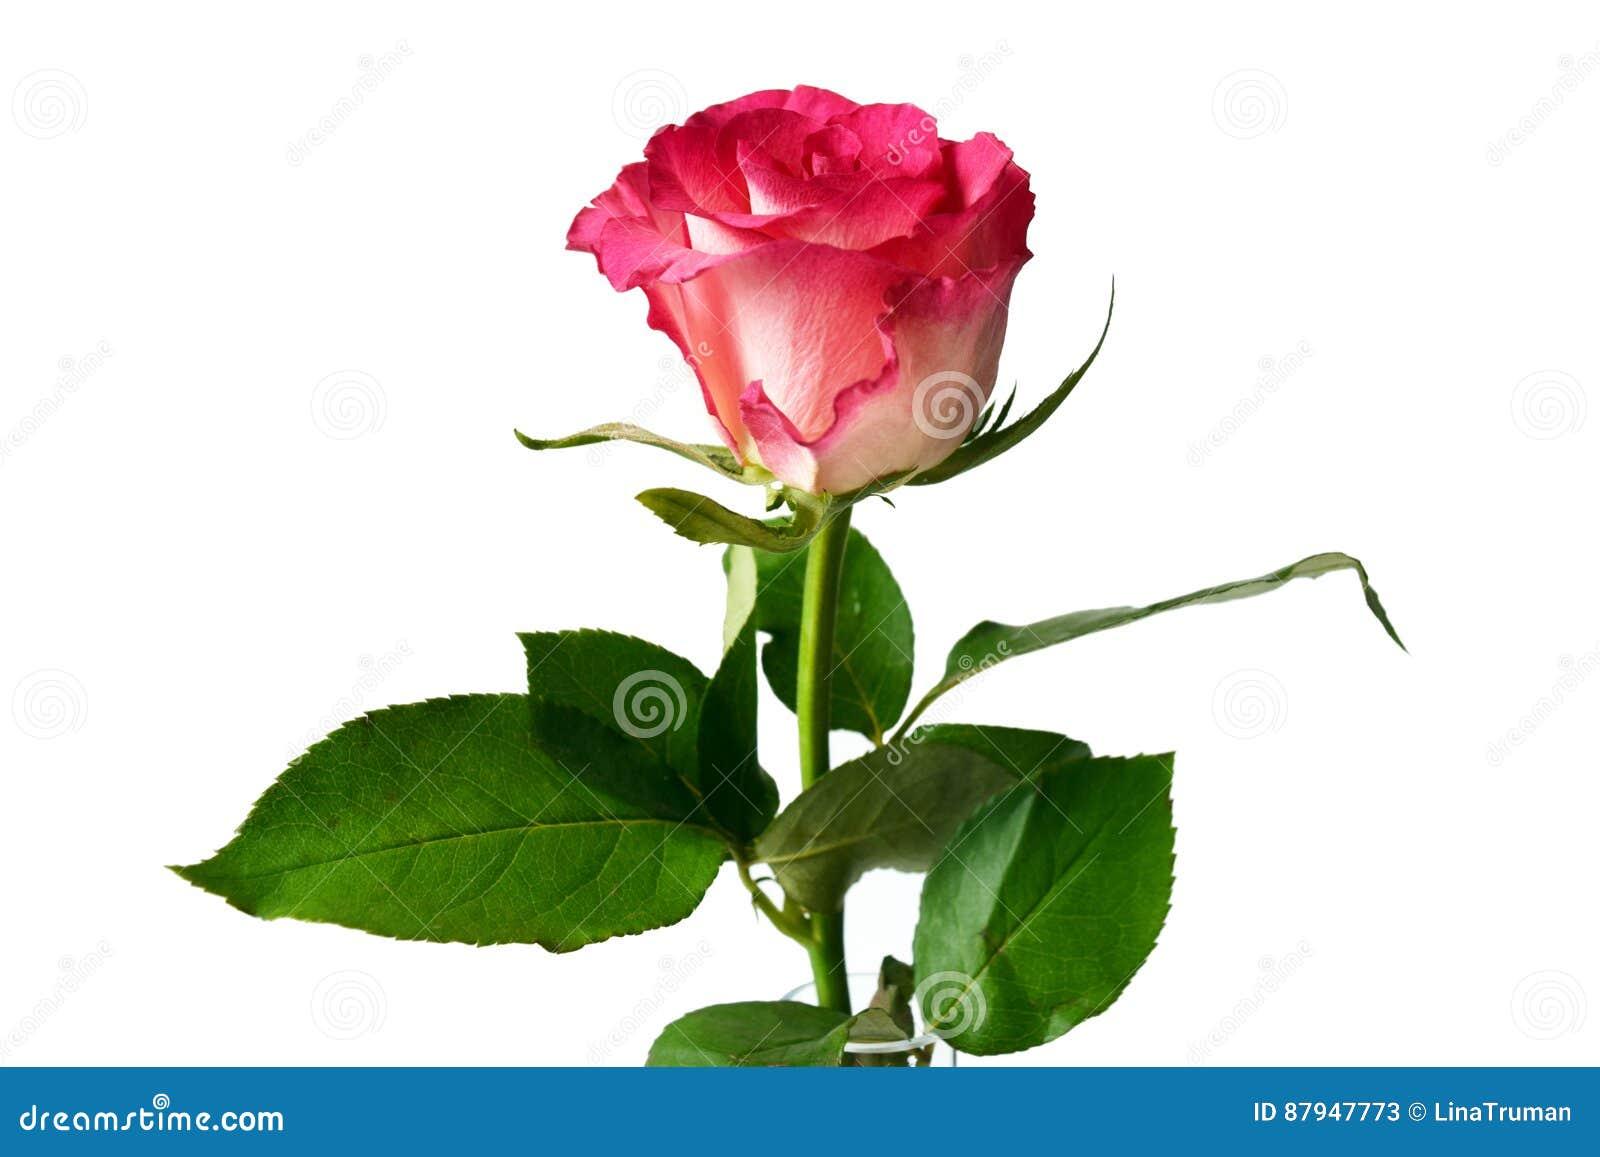 Pink Beauty Flower Single Rose: Single Pink Rose On White Background. Stock Image